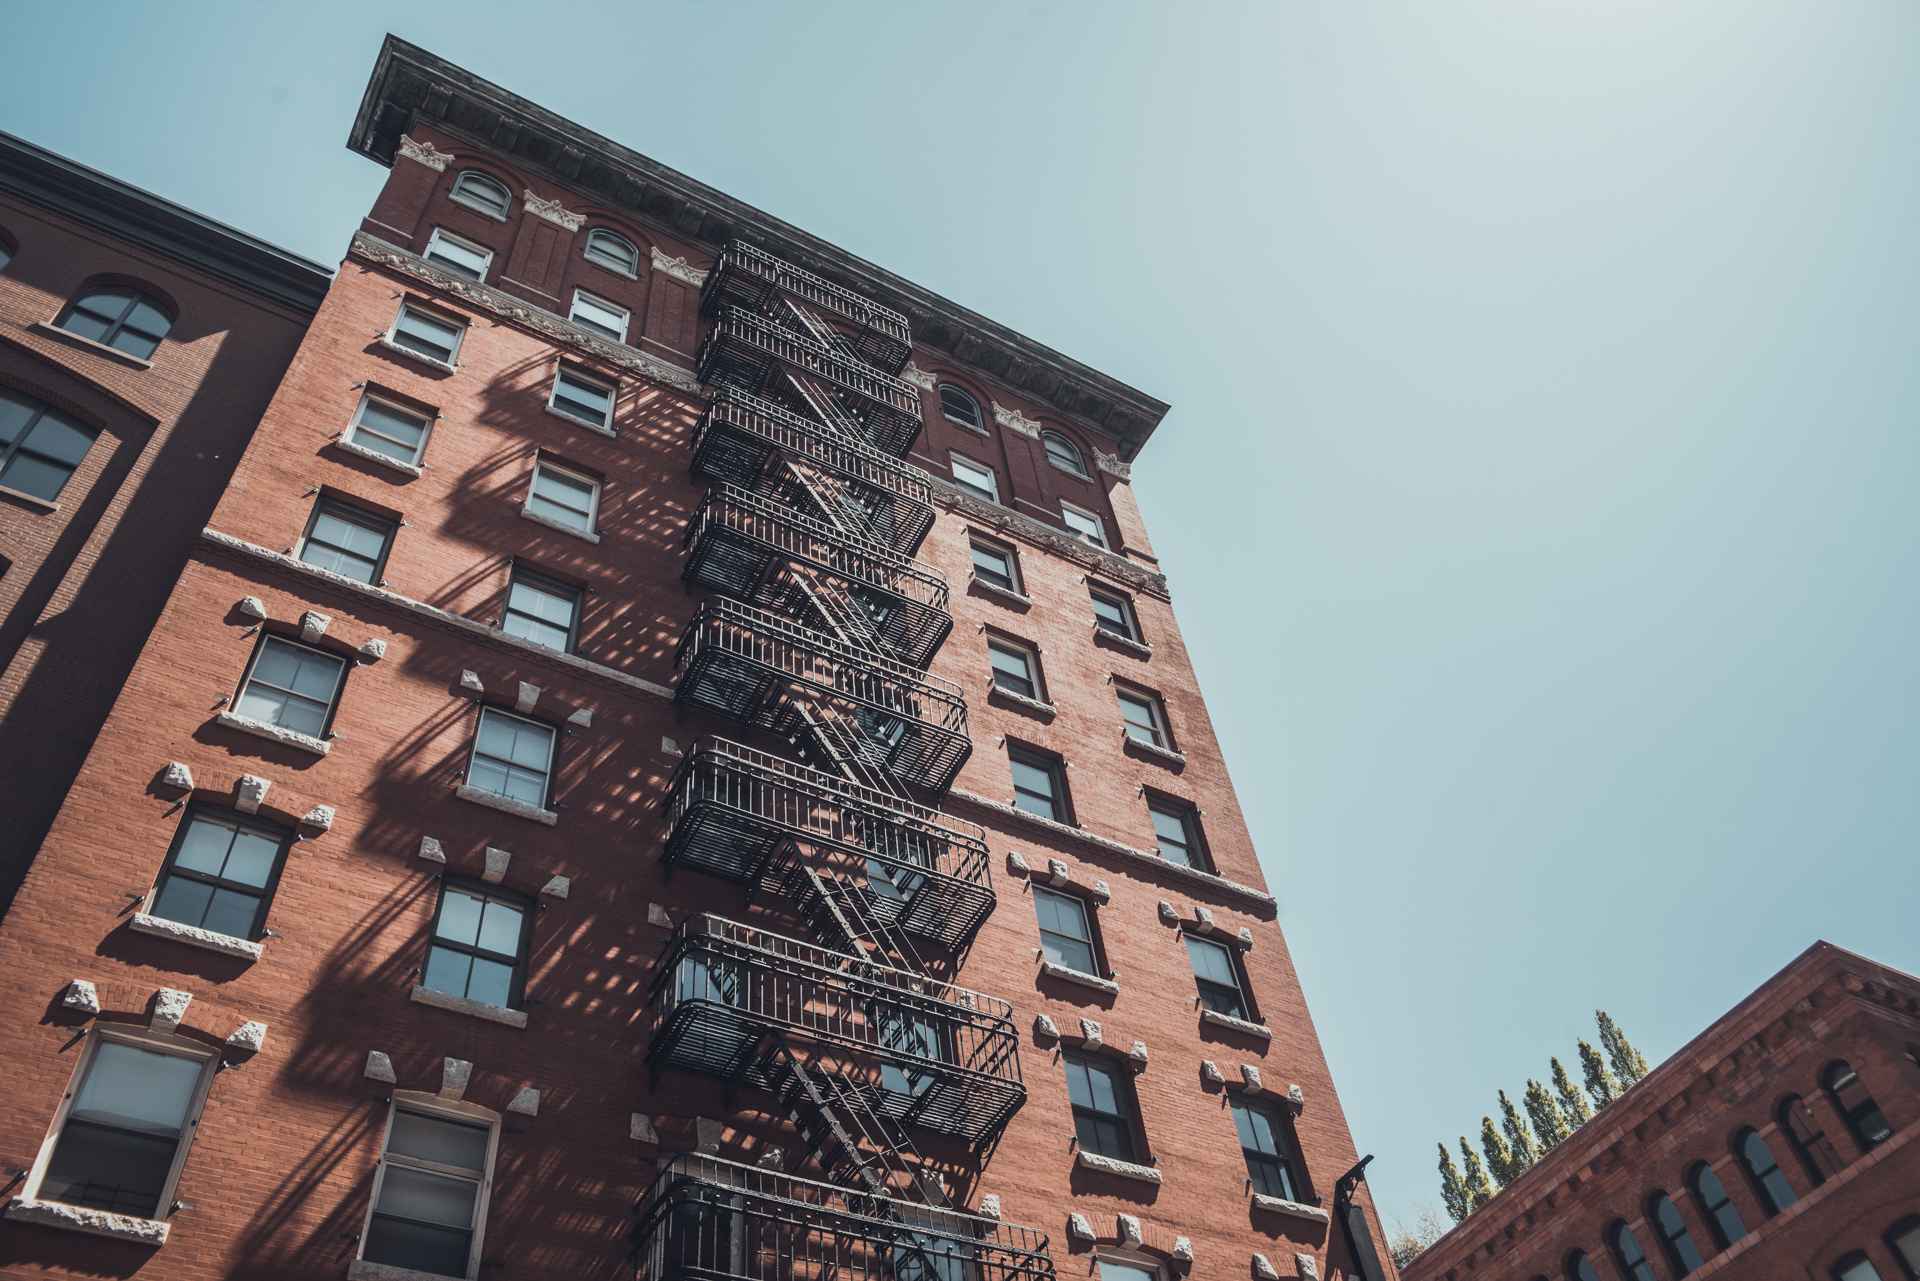 NYC_stijn_hoekstra-115.jpg